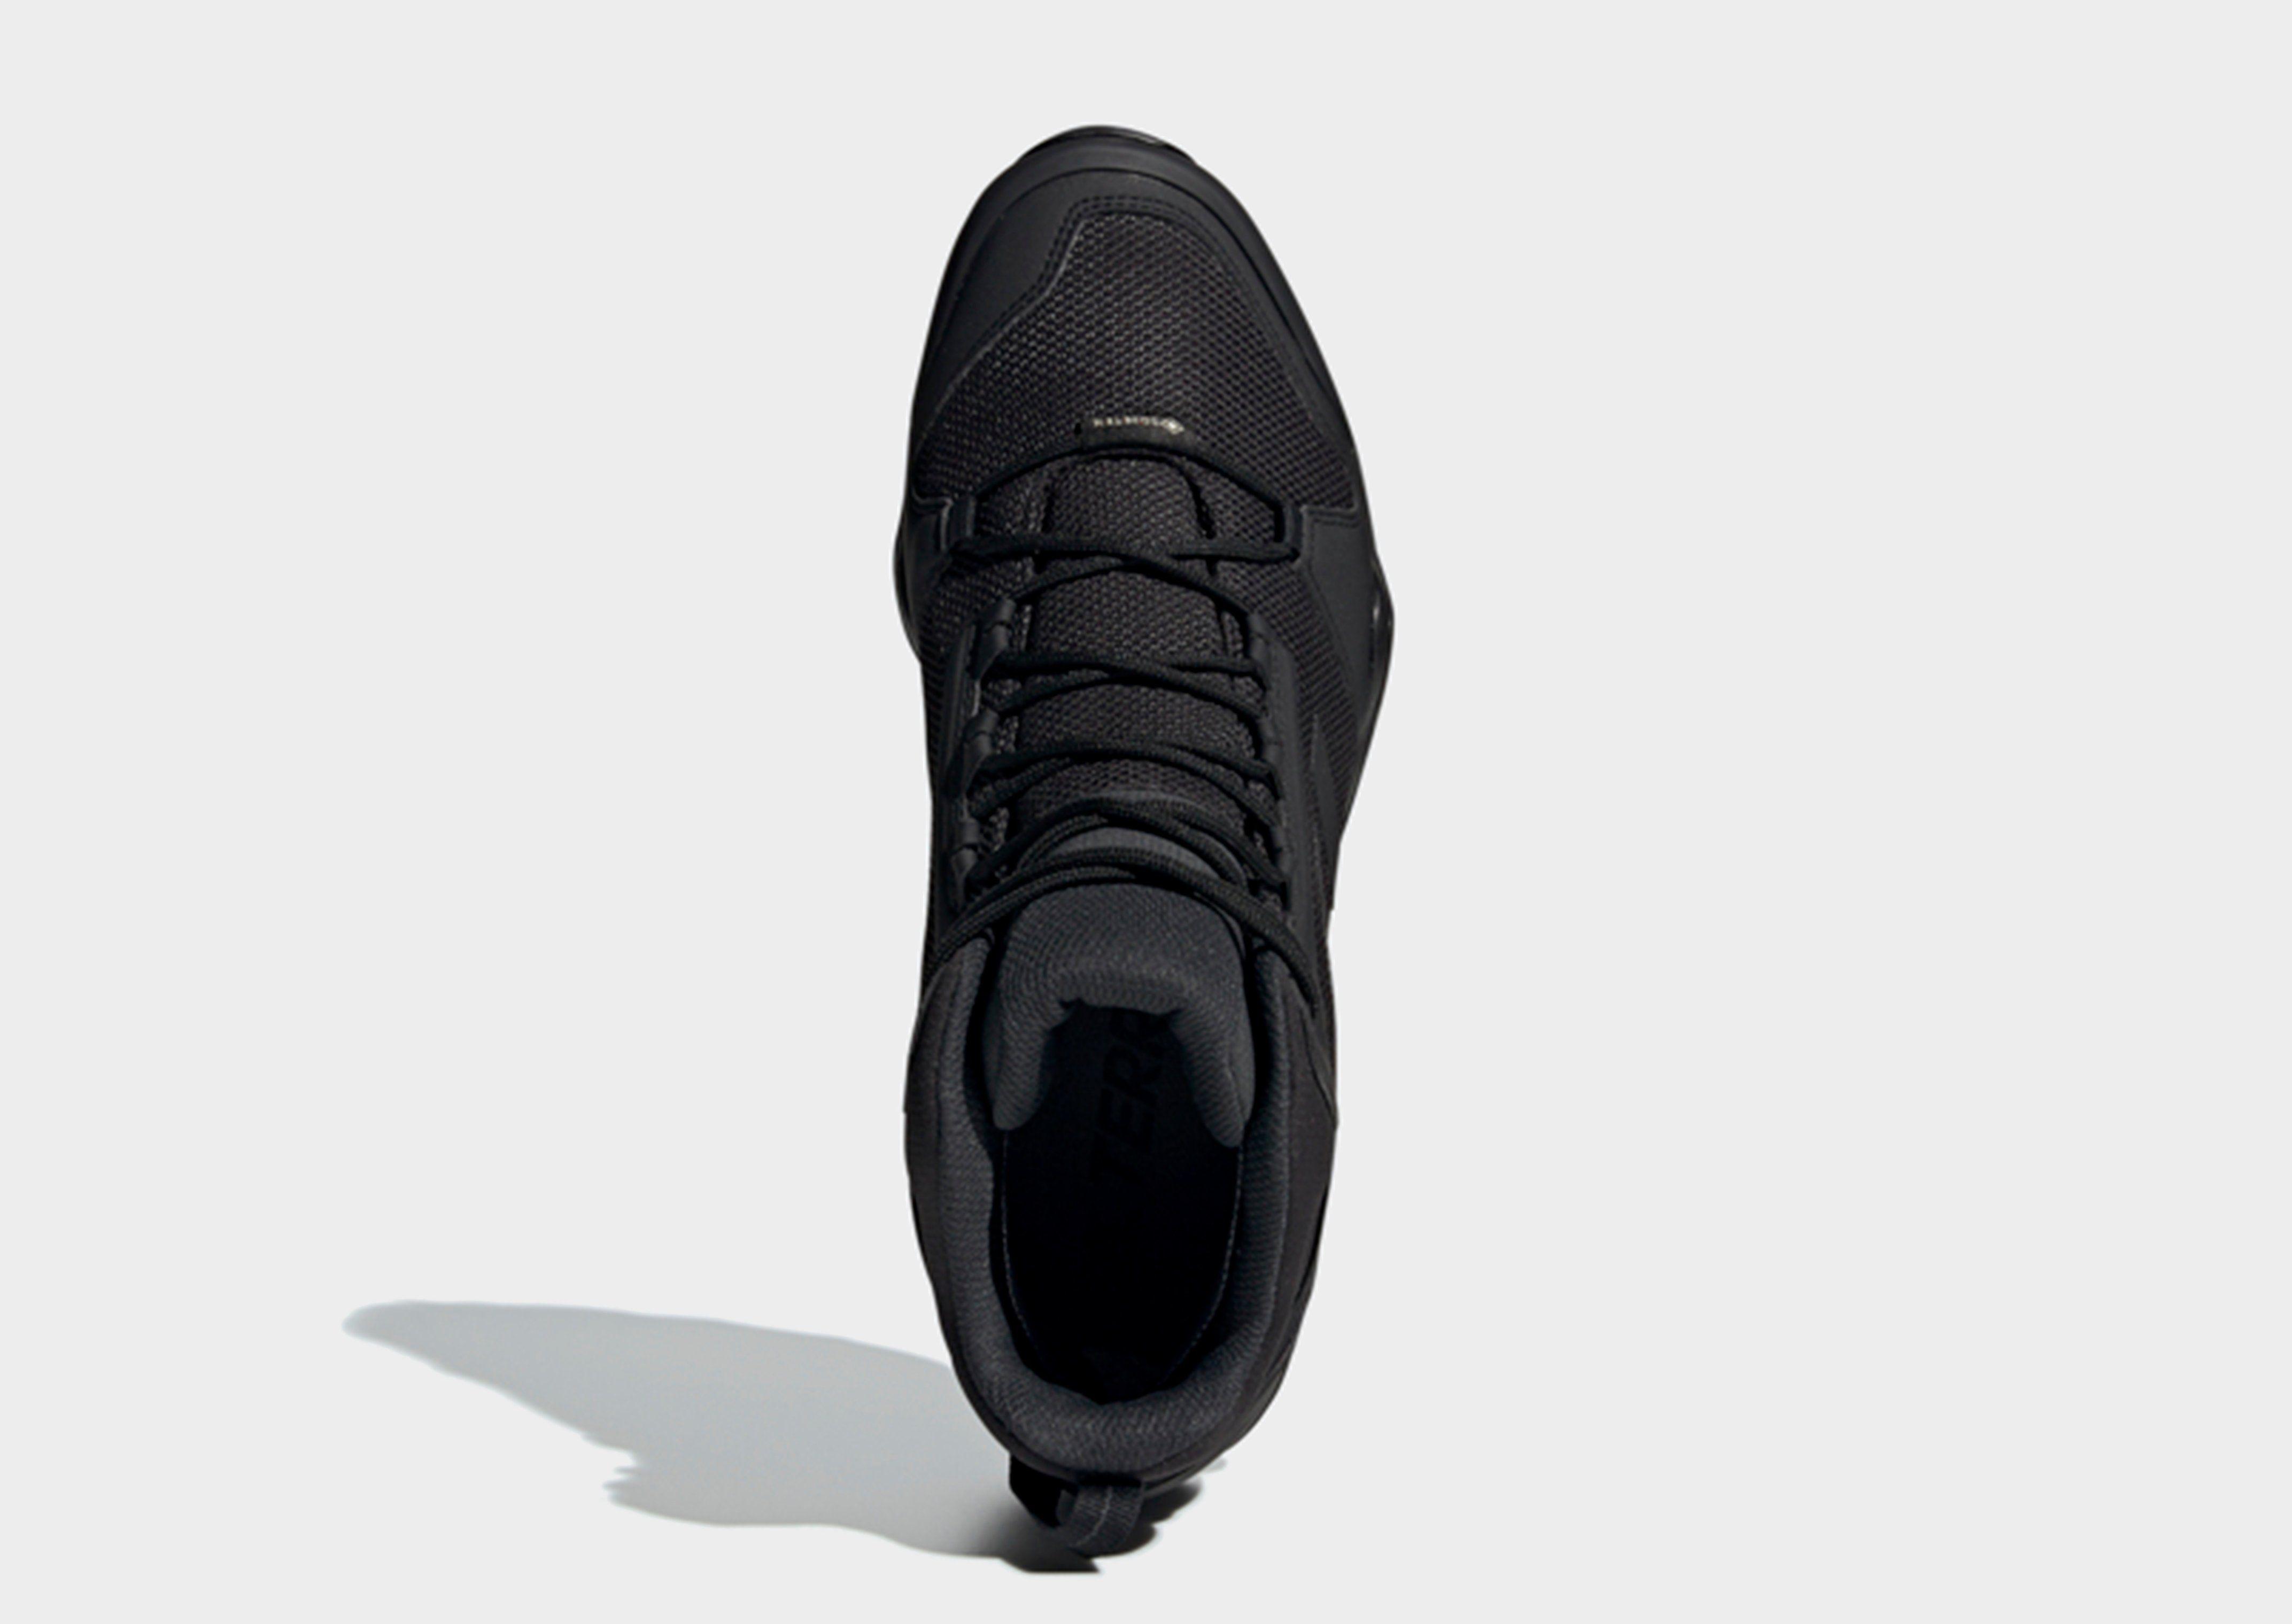 ADIDAS Terrex AX3 Mid GTX Shoes